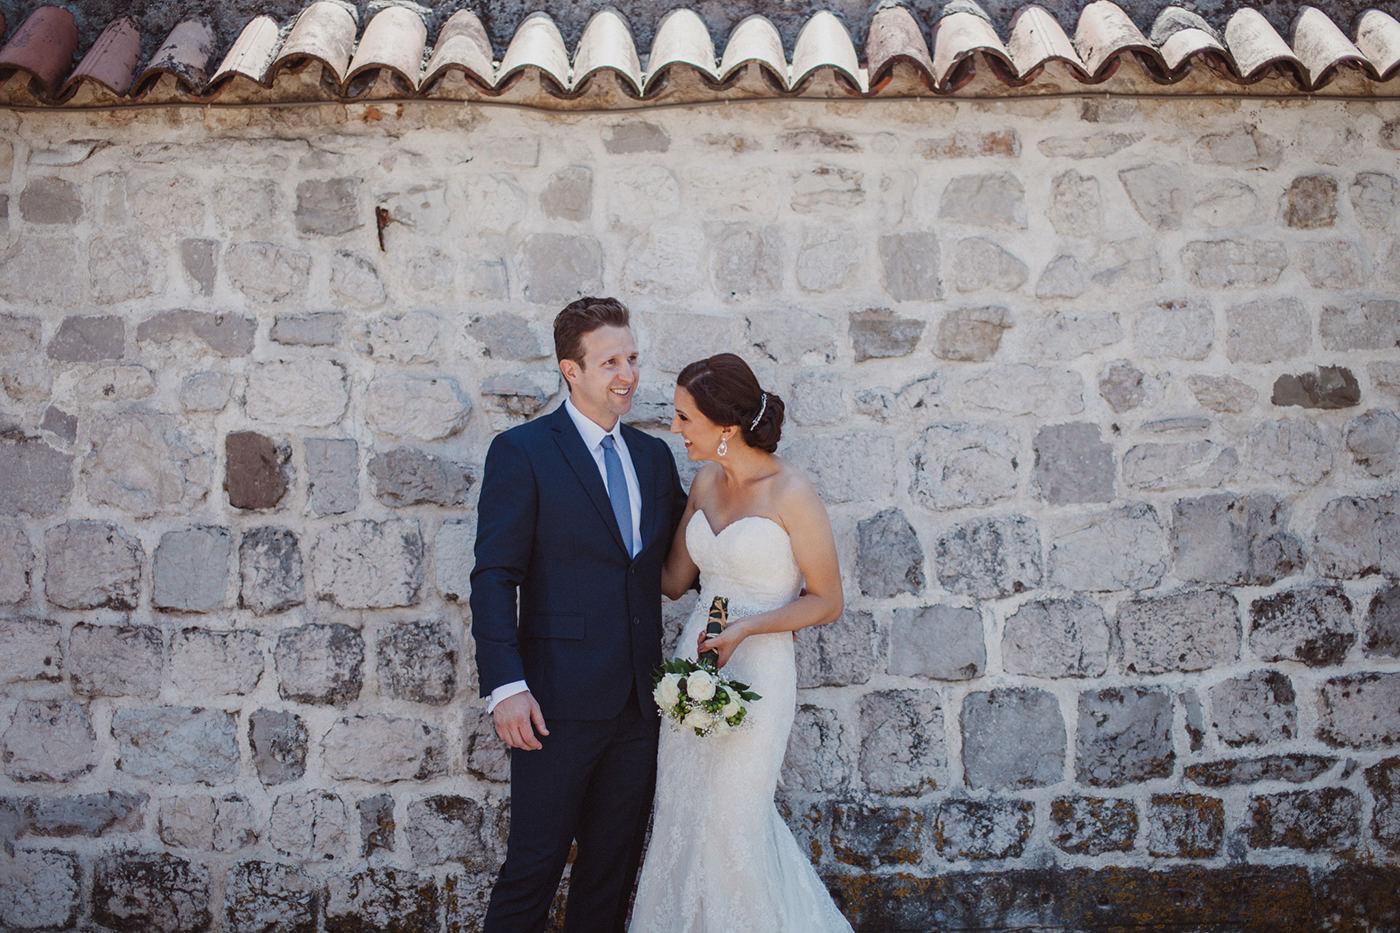 irena-ryan-destination-wedding-photographer-montenegro-kotor-0075